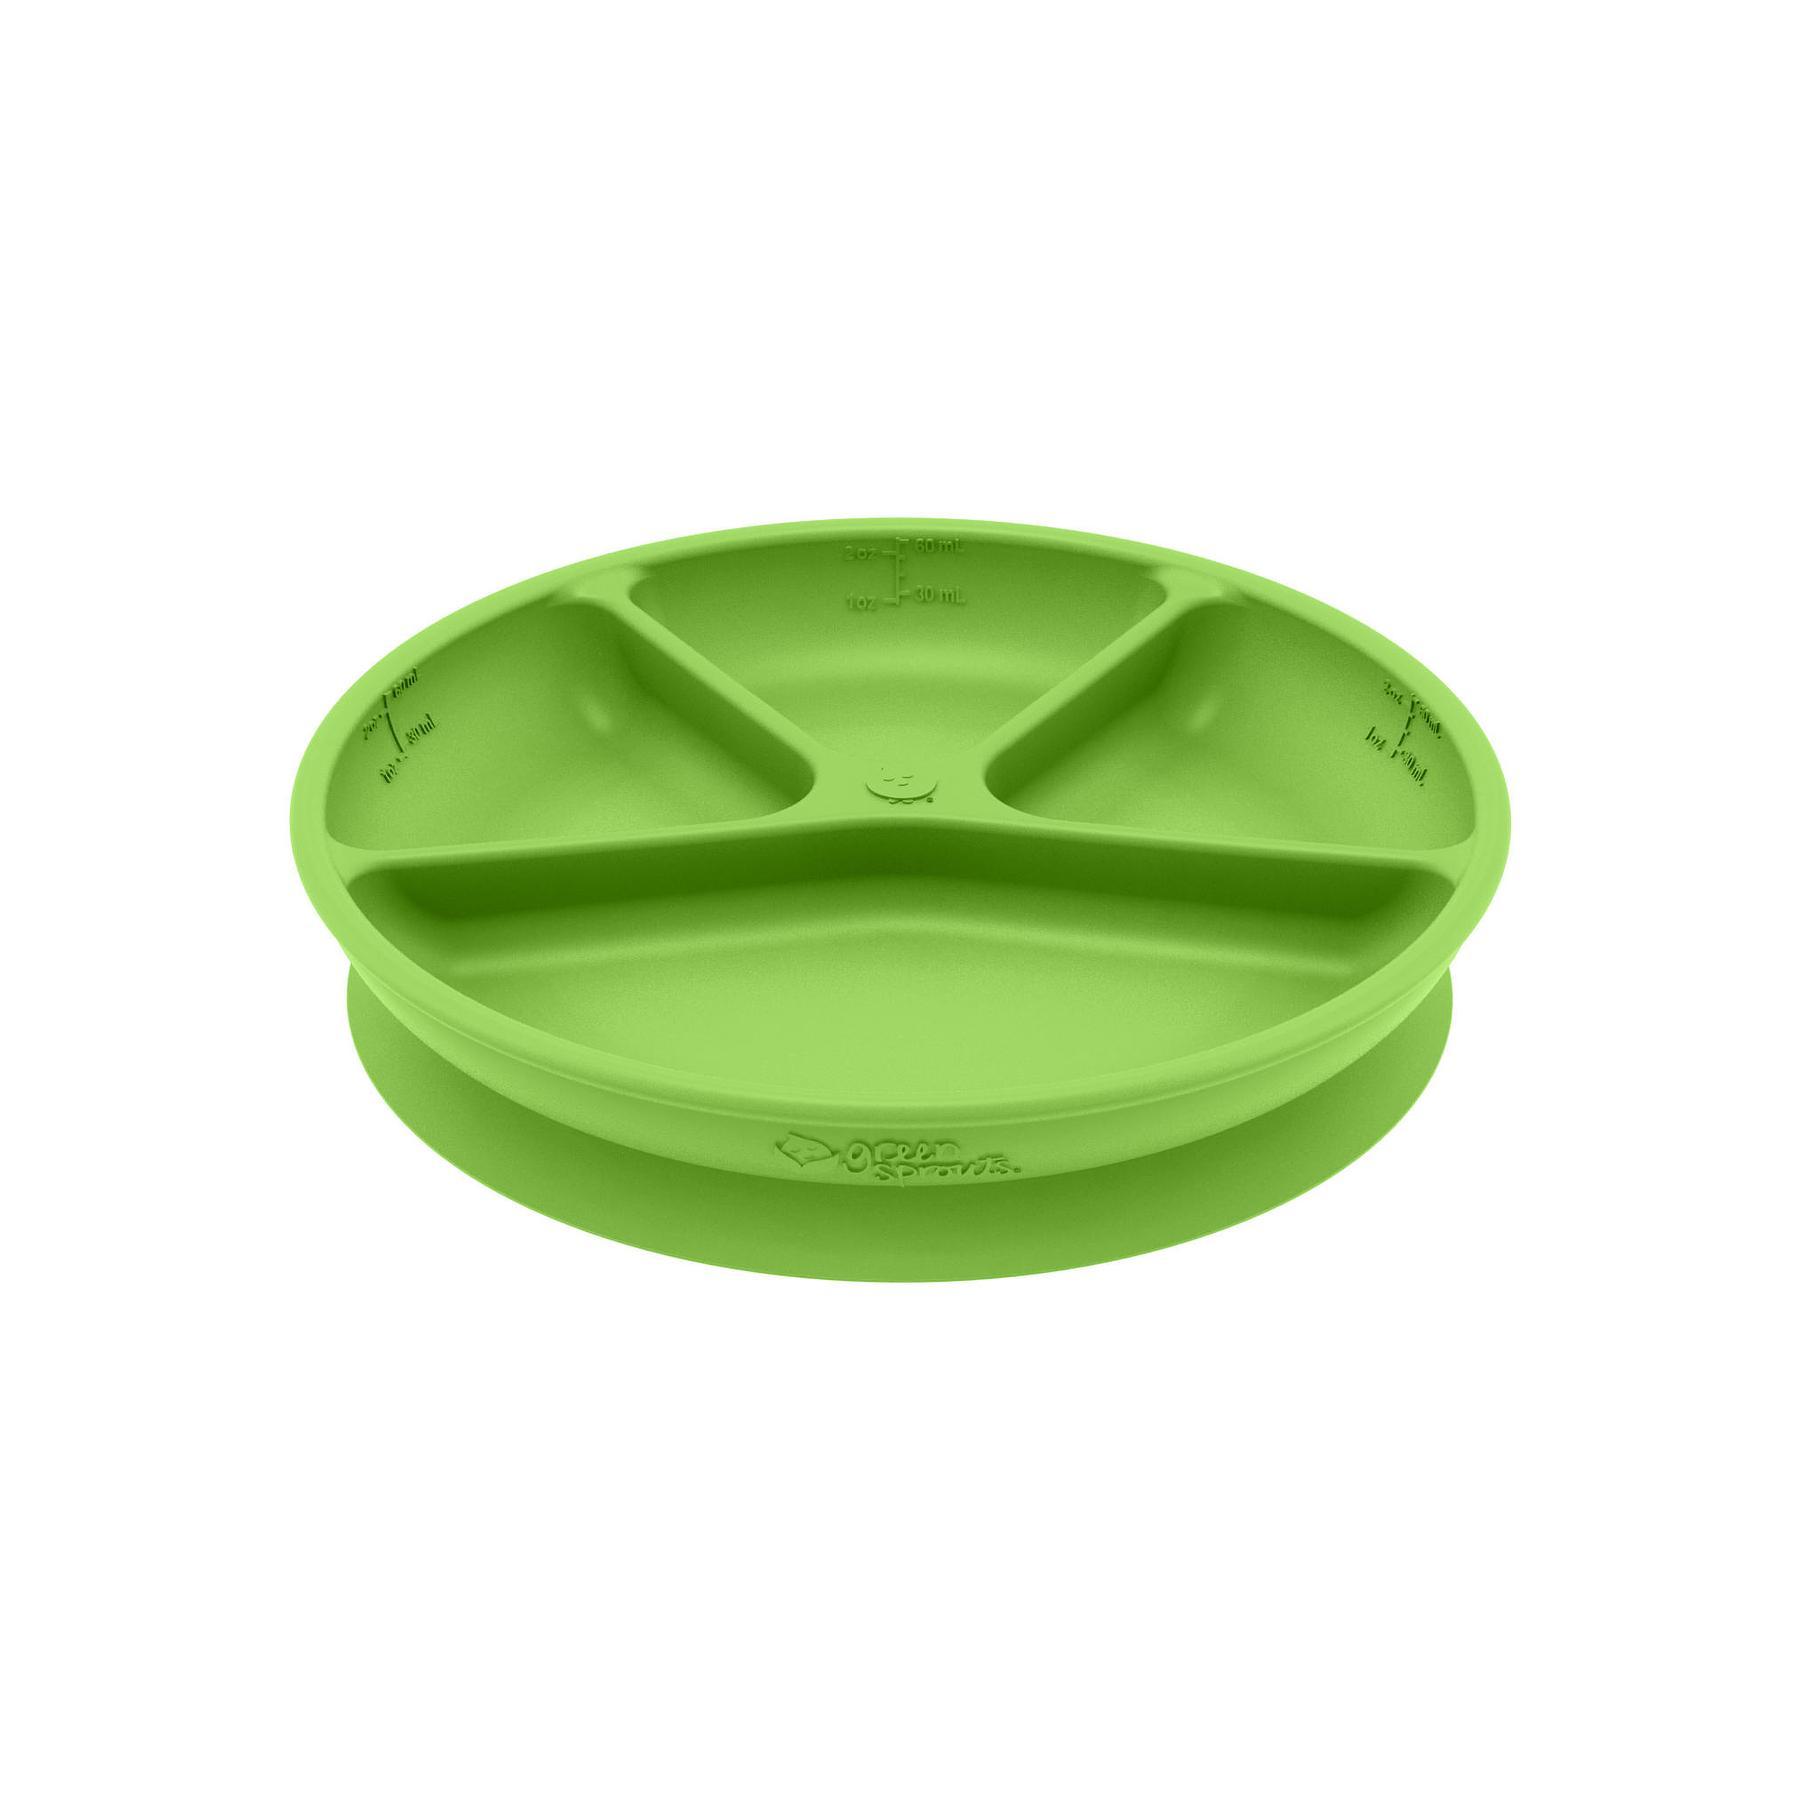 Plato Adherente 100% Silicona Verde